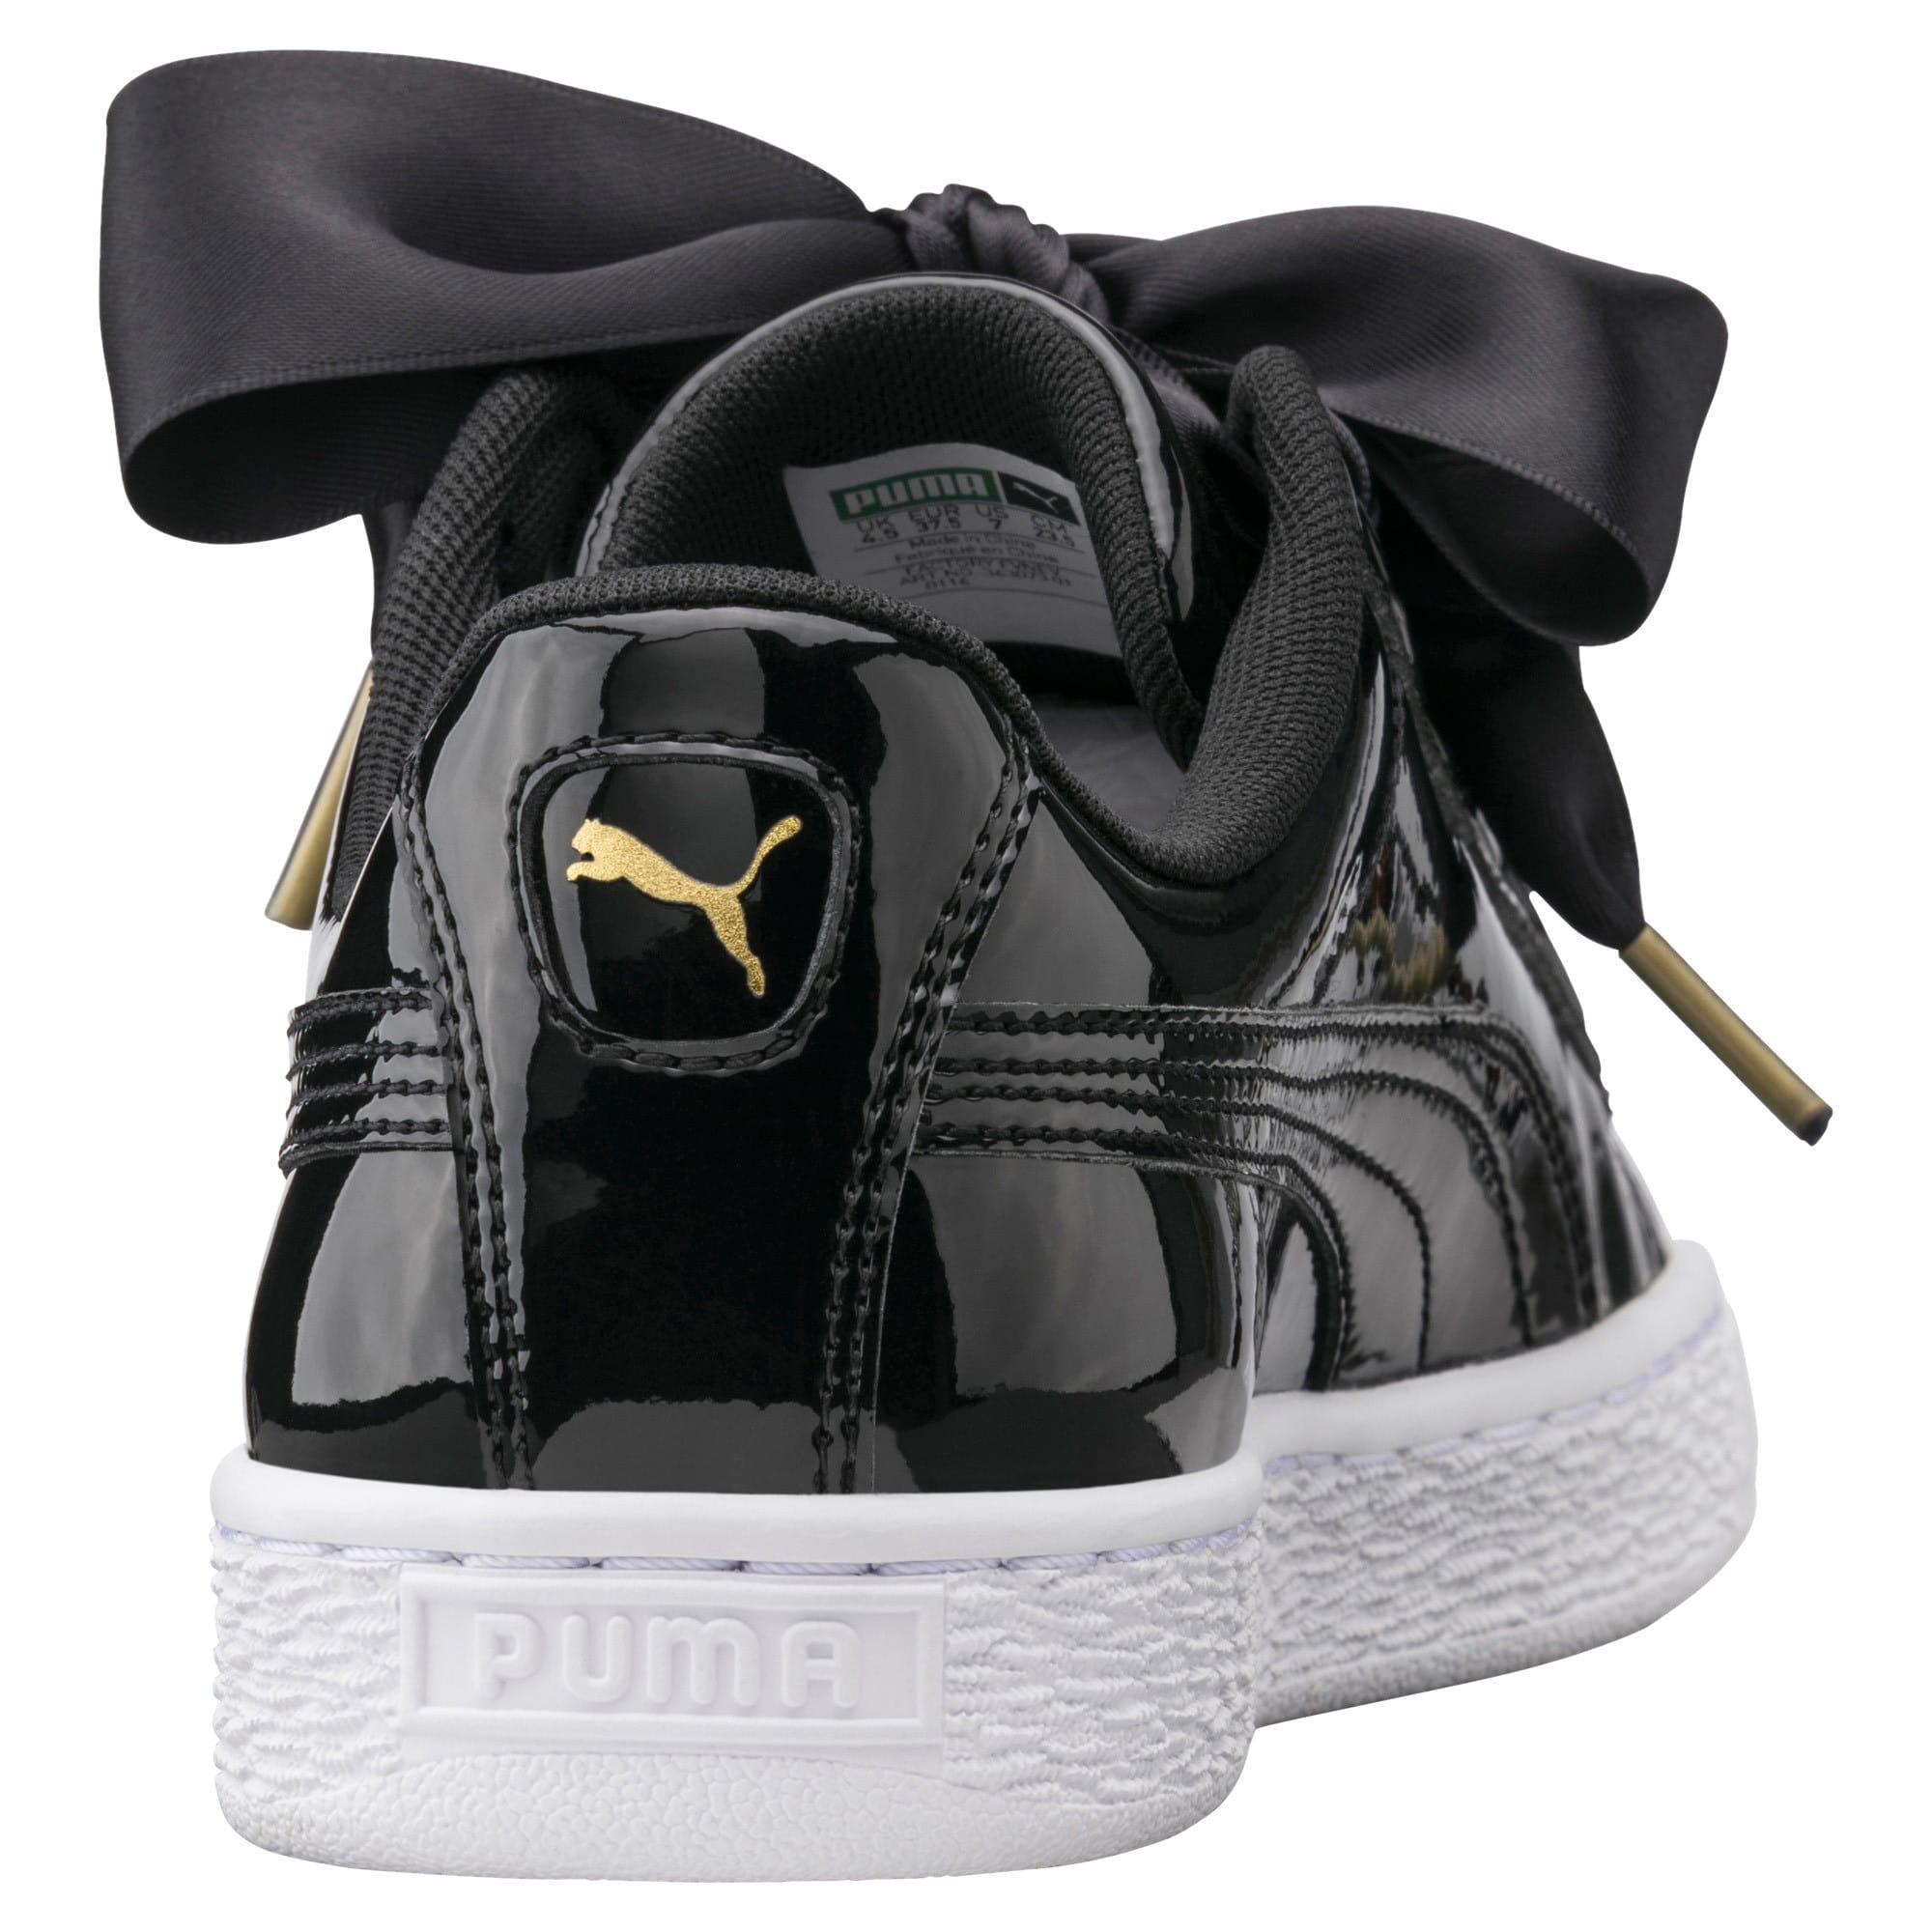 Thumbnail 3 of Basket Heart Patent Women's Trainers, Puma Black-Puma Black, medium